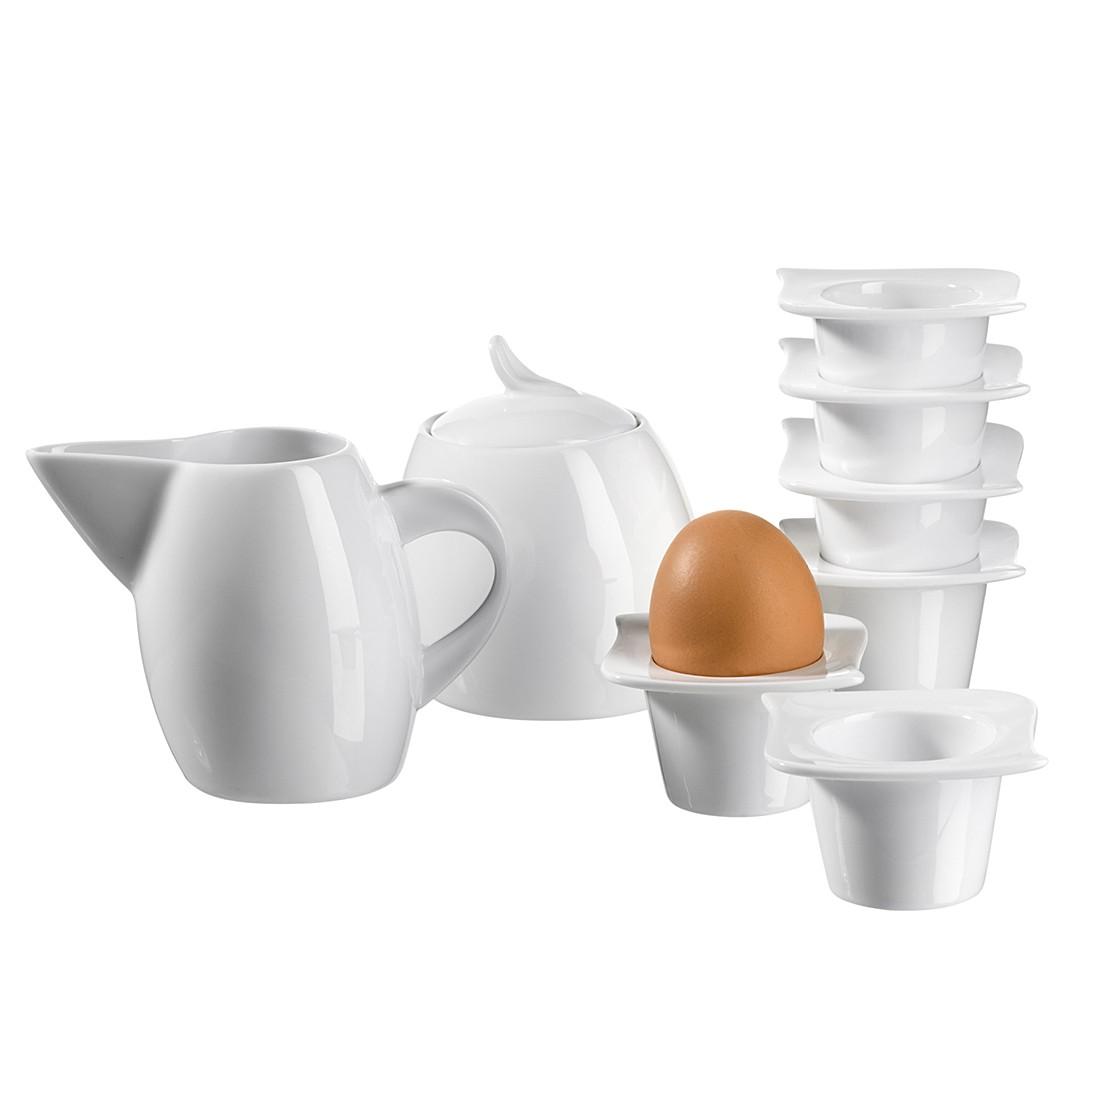 Frühstücks- Set (8- teilig) La Musica, Mäser günstig